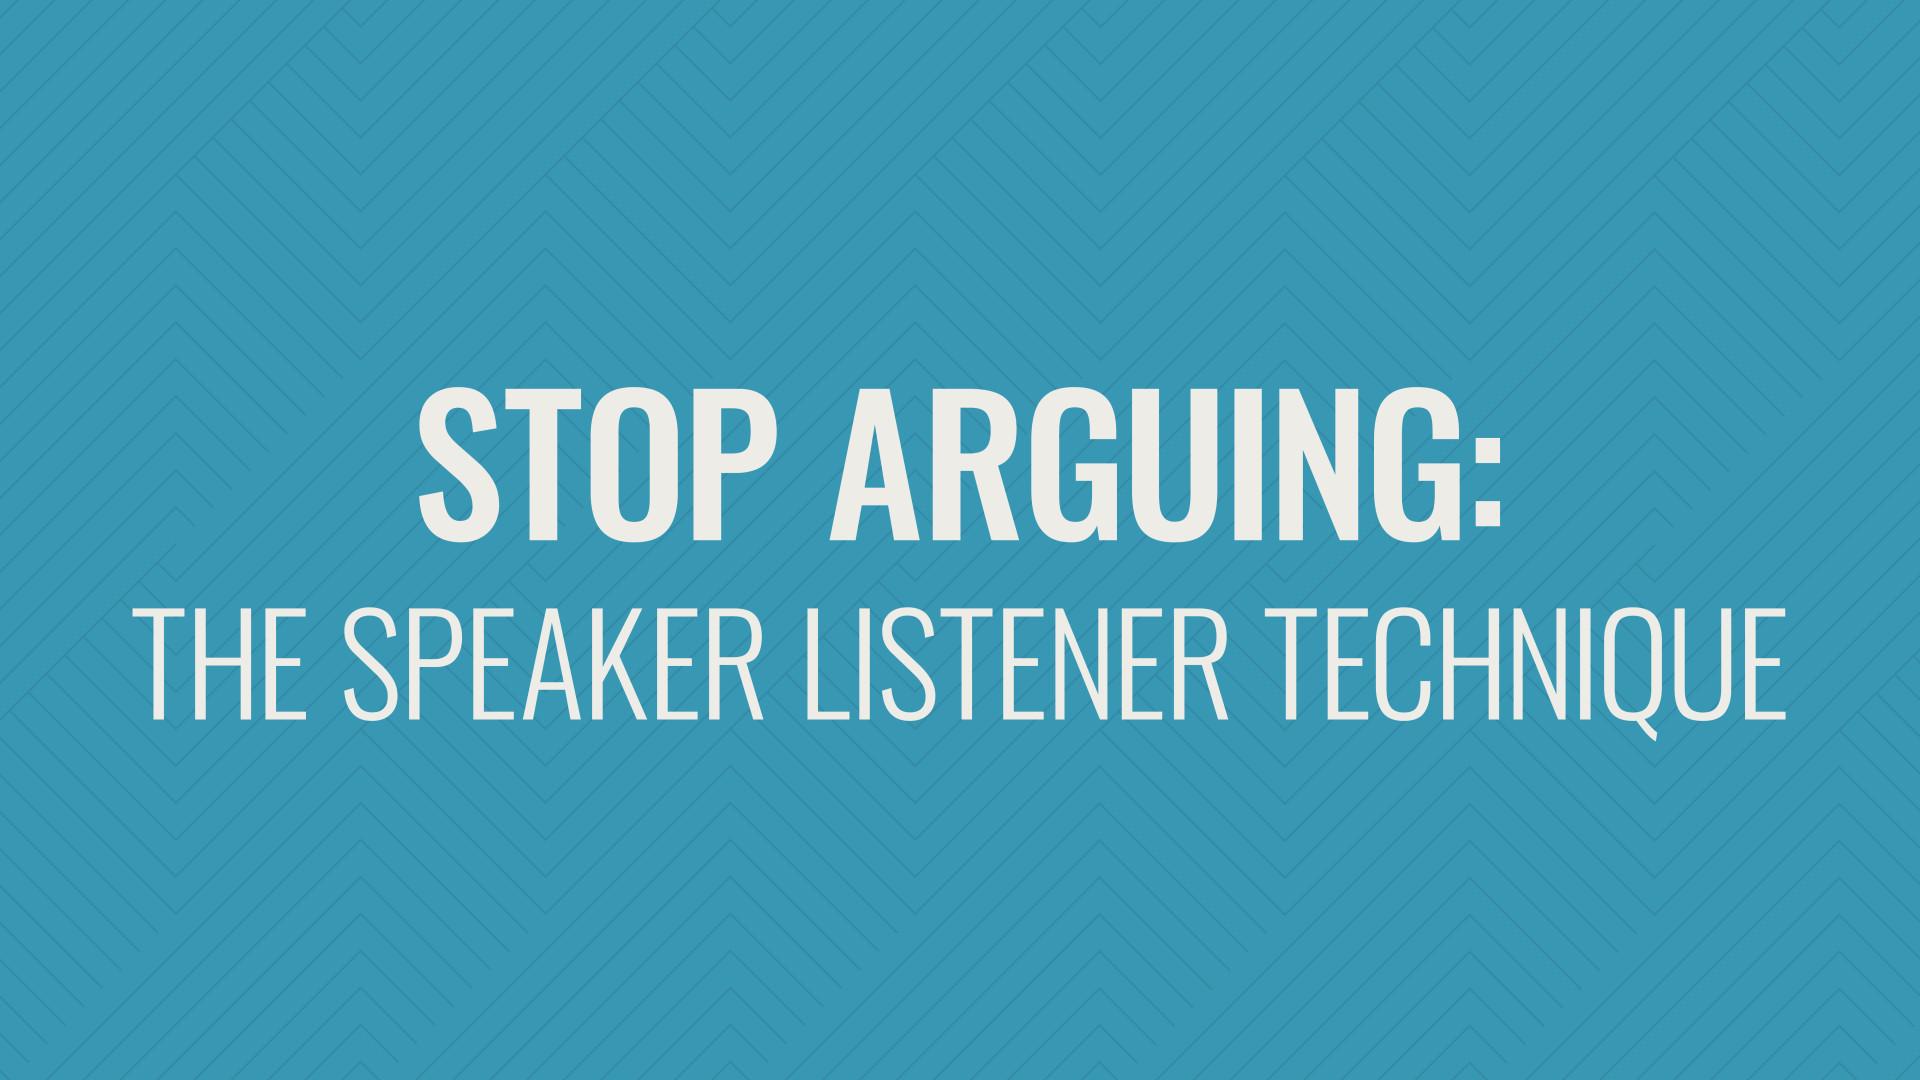 Stop Arguing Hero Image